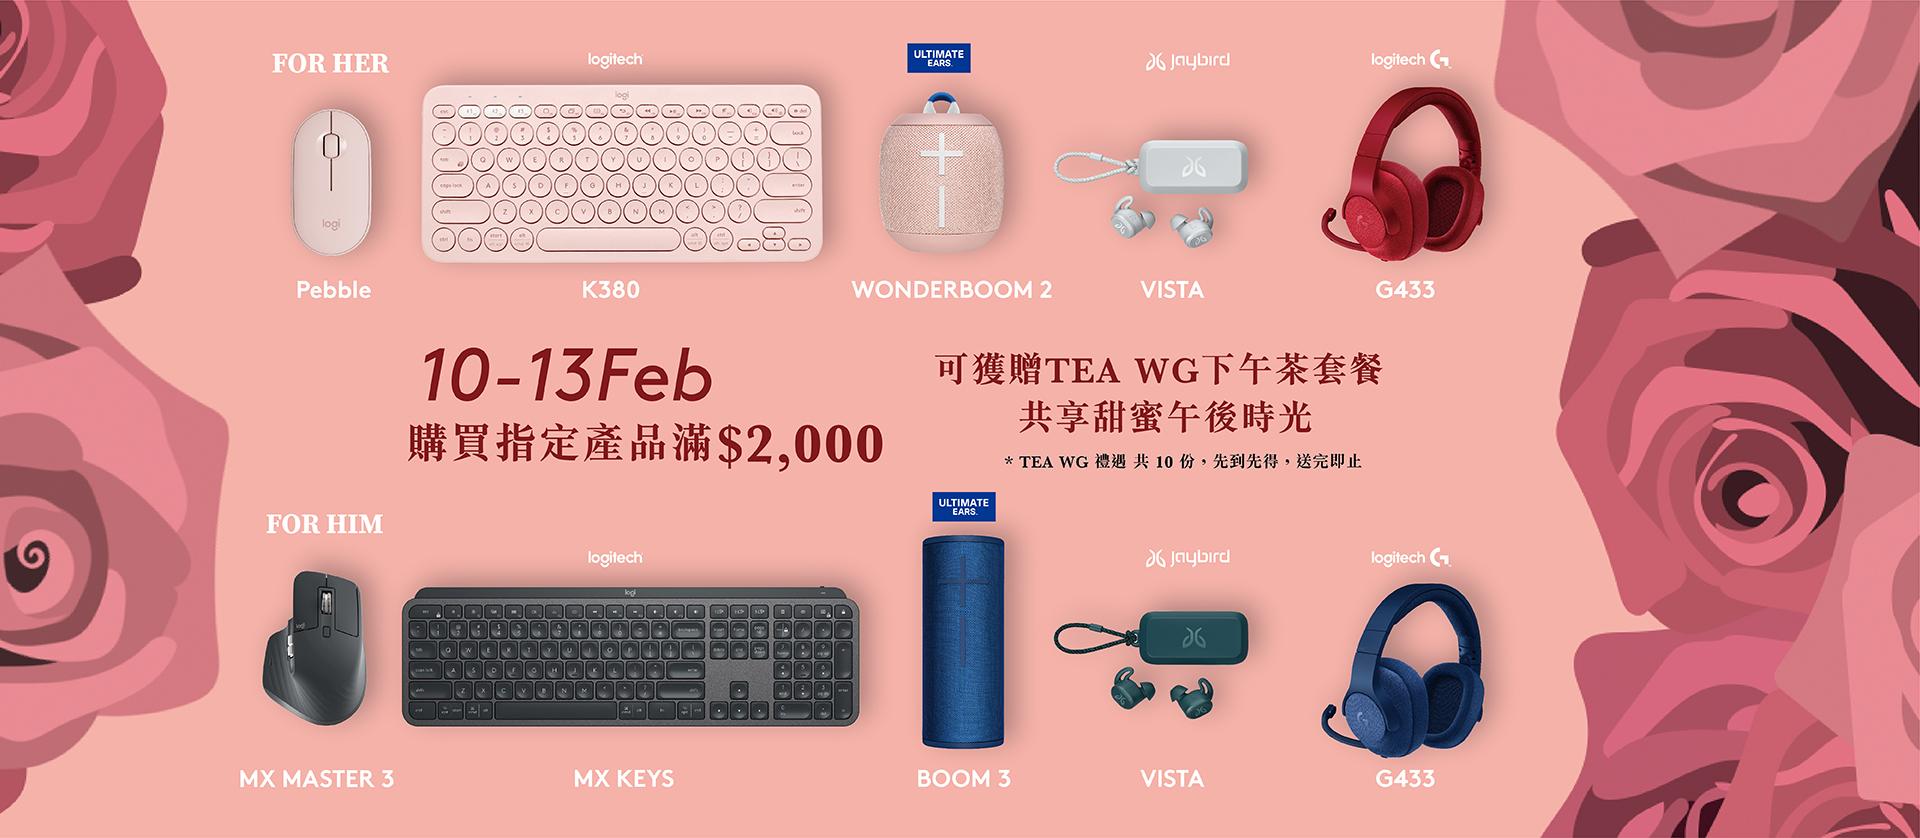 Logitech Club 情人節禮遇 滿 HK$600 免費送貨上門